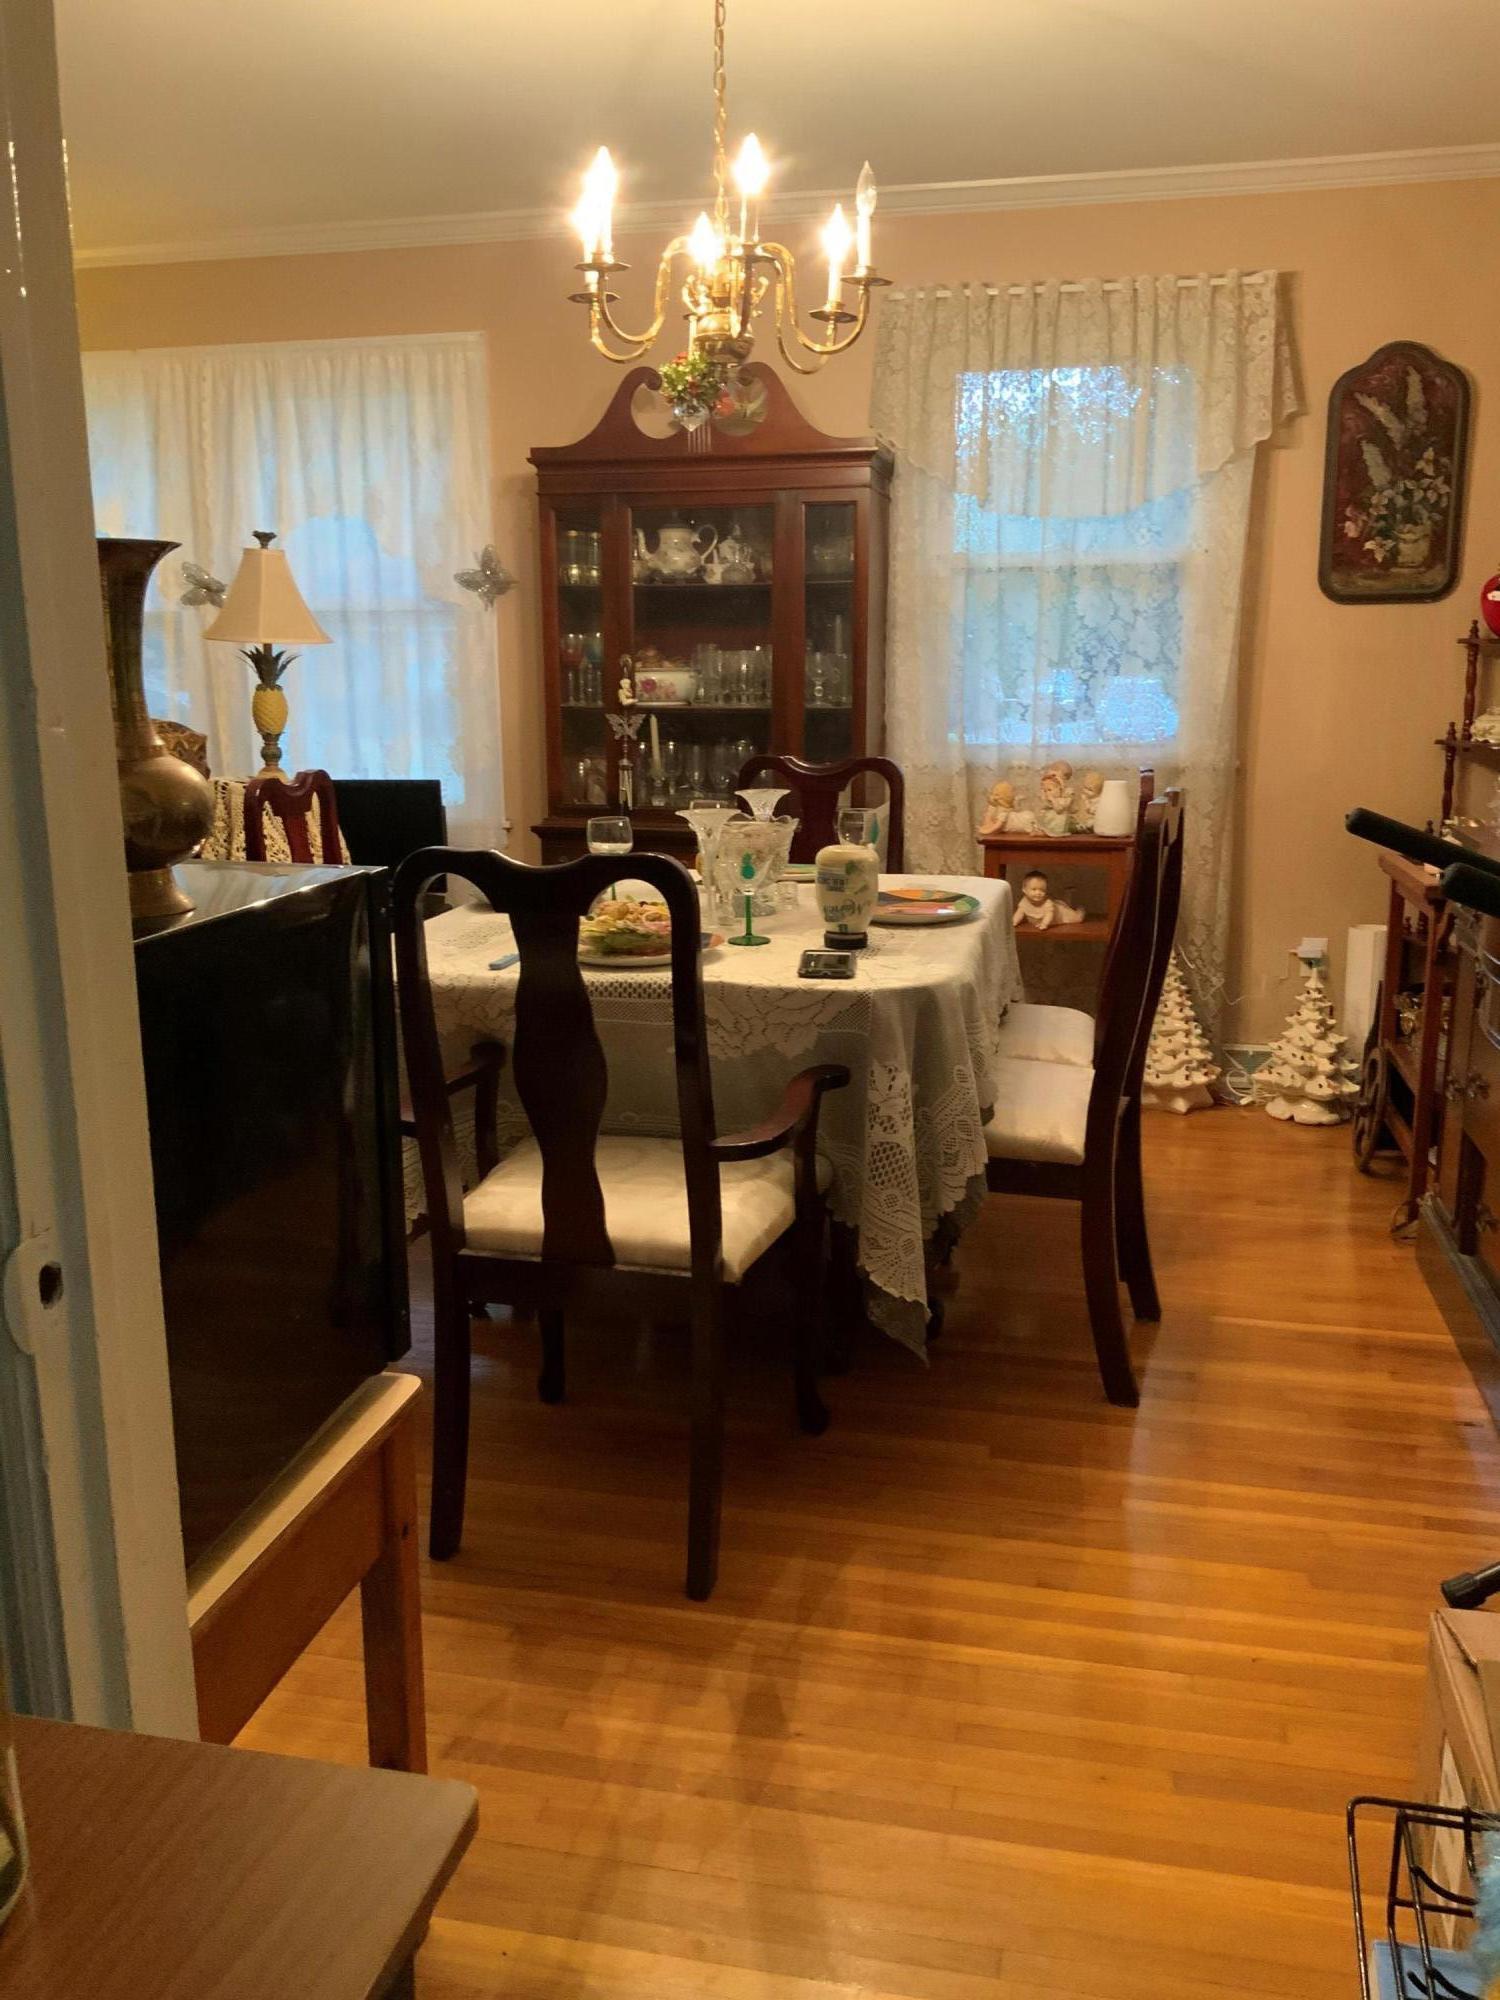 Northbridge Terrace Homes For Sale - 1156 Northbridge, Charleston, SC - 9